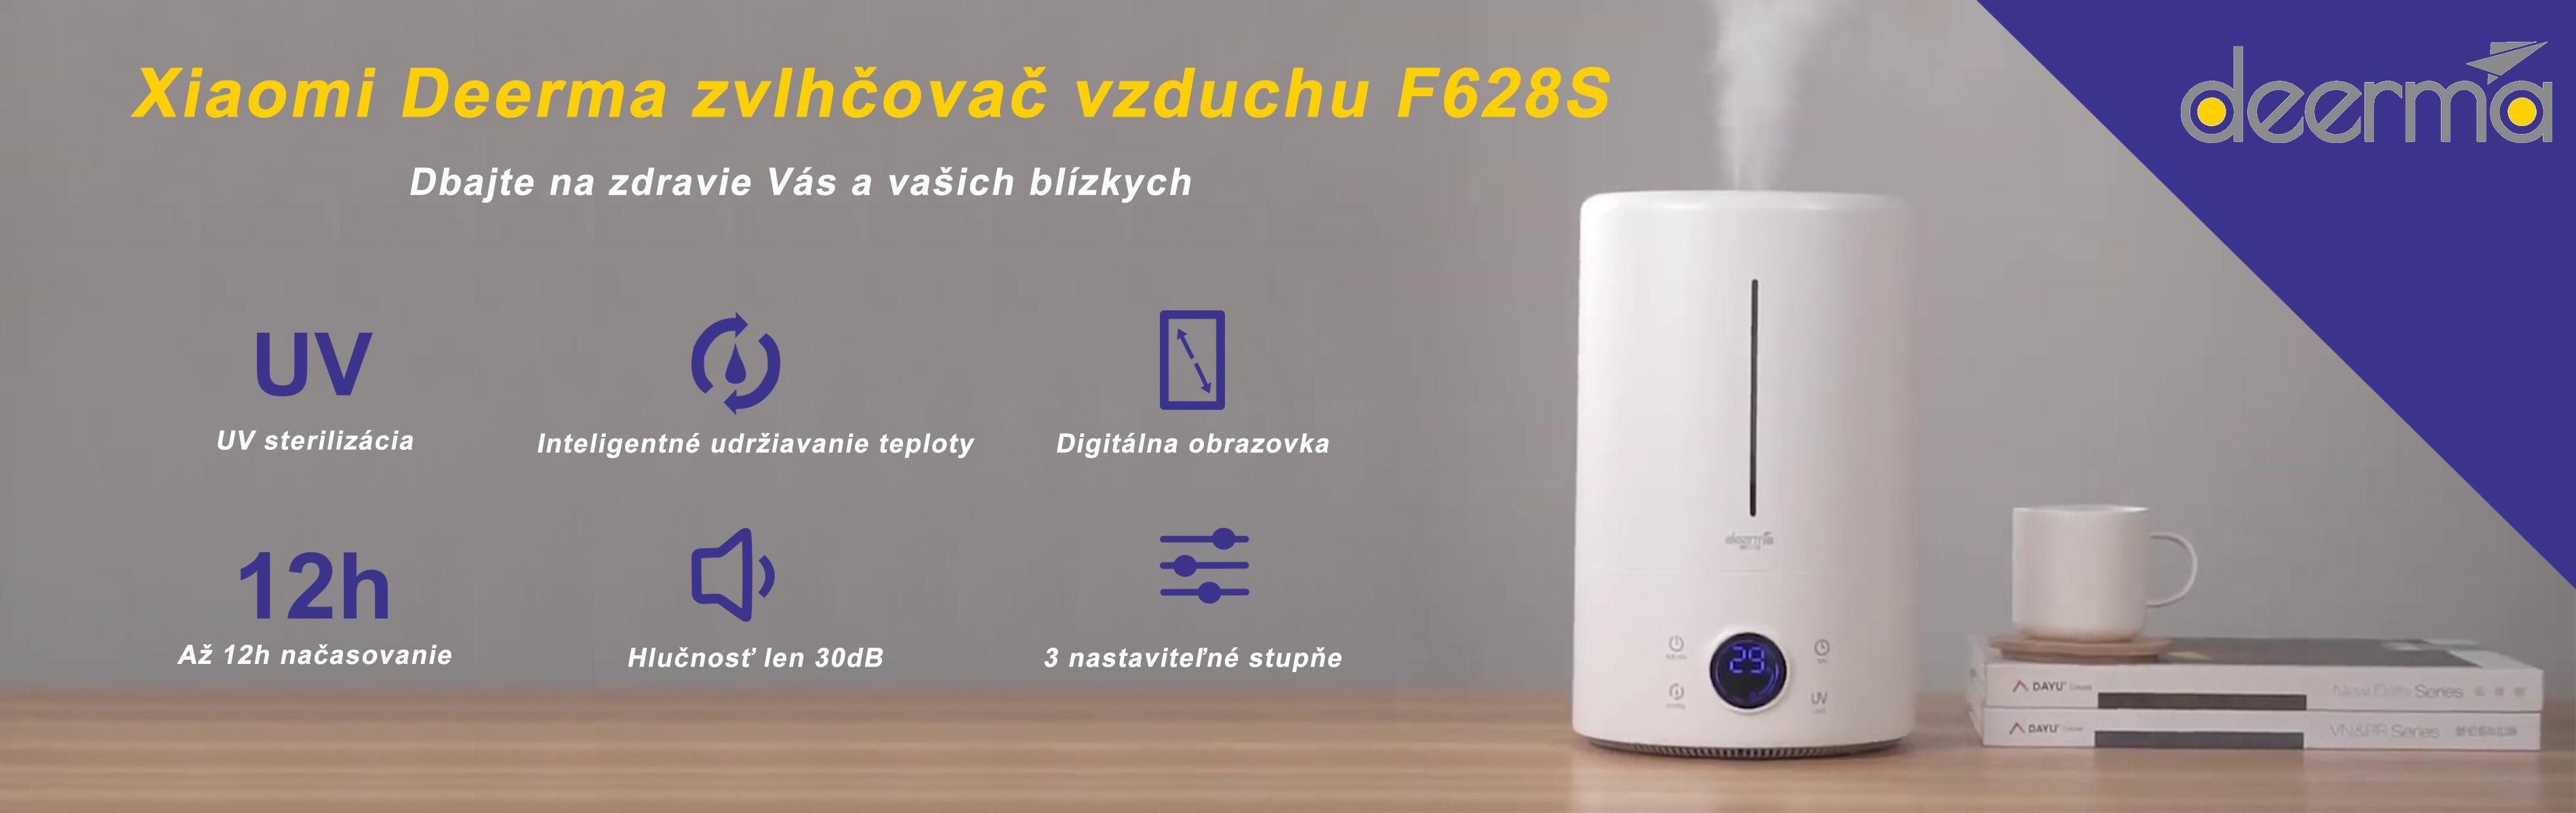 Xiaomi Deerma zvlhčovač vzduchu F628S